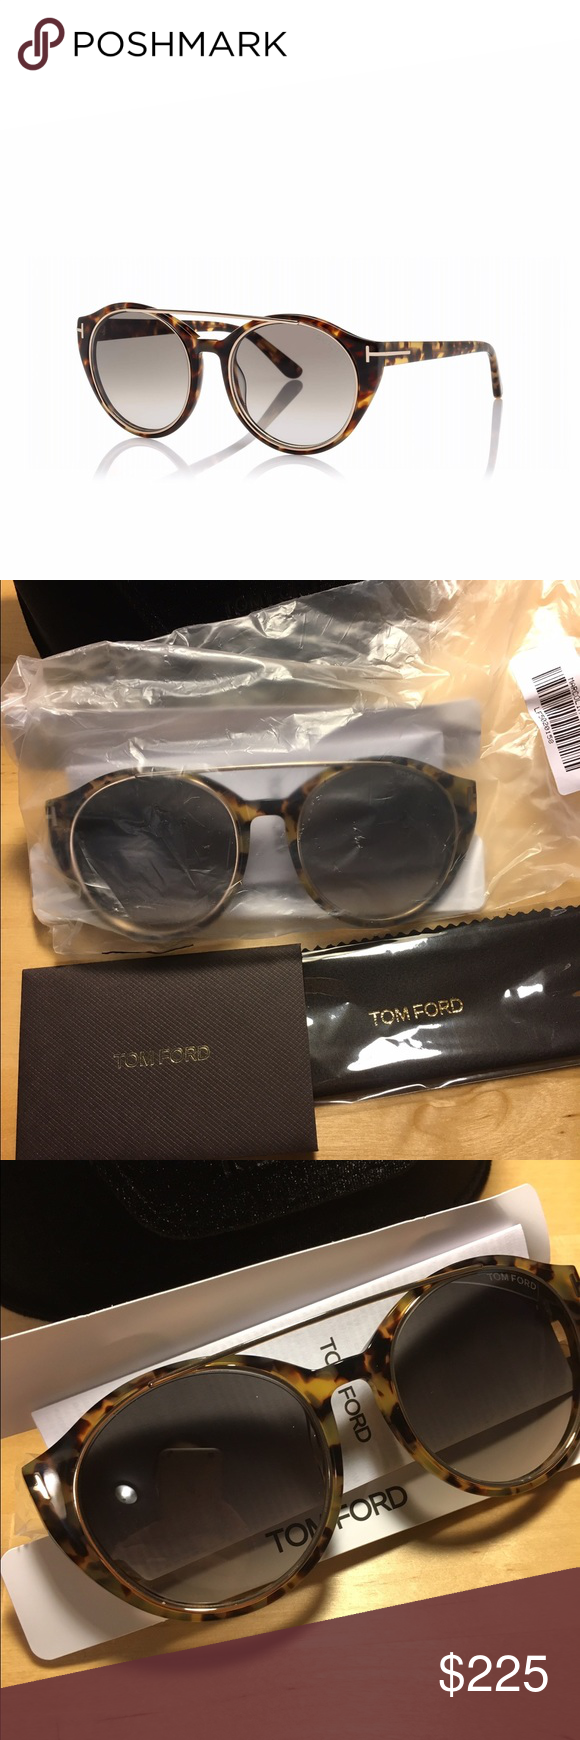 83f7932f9f2 Tom Ford Joan sunglasses Tom Ford Joan sunglasses. Frame color Havana.  Plastic and metal